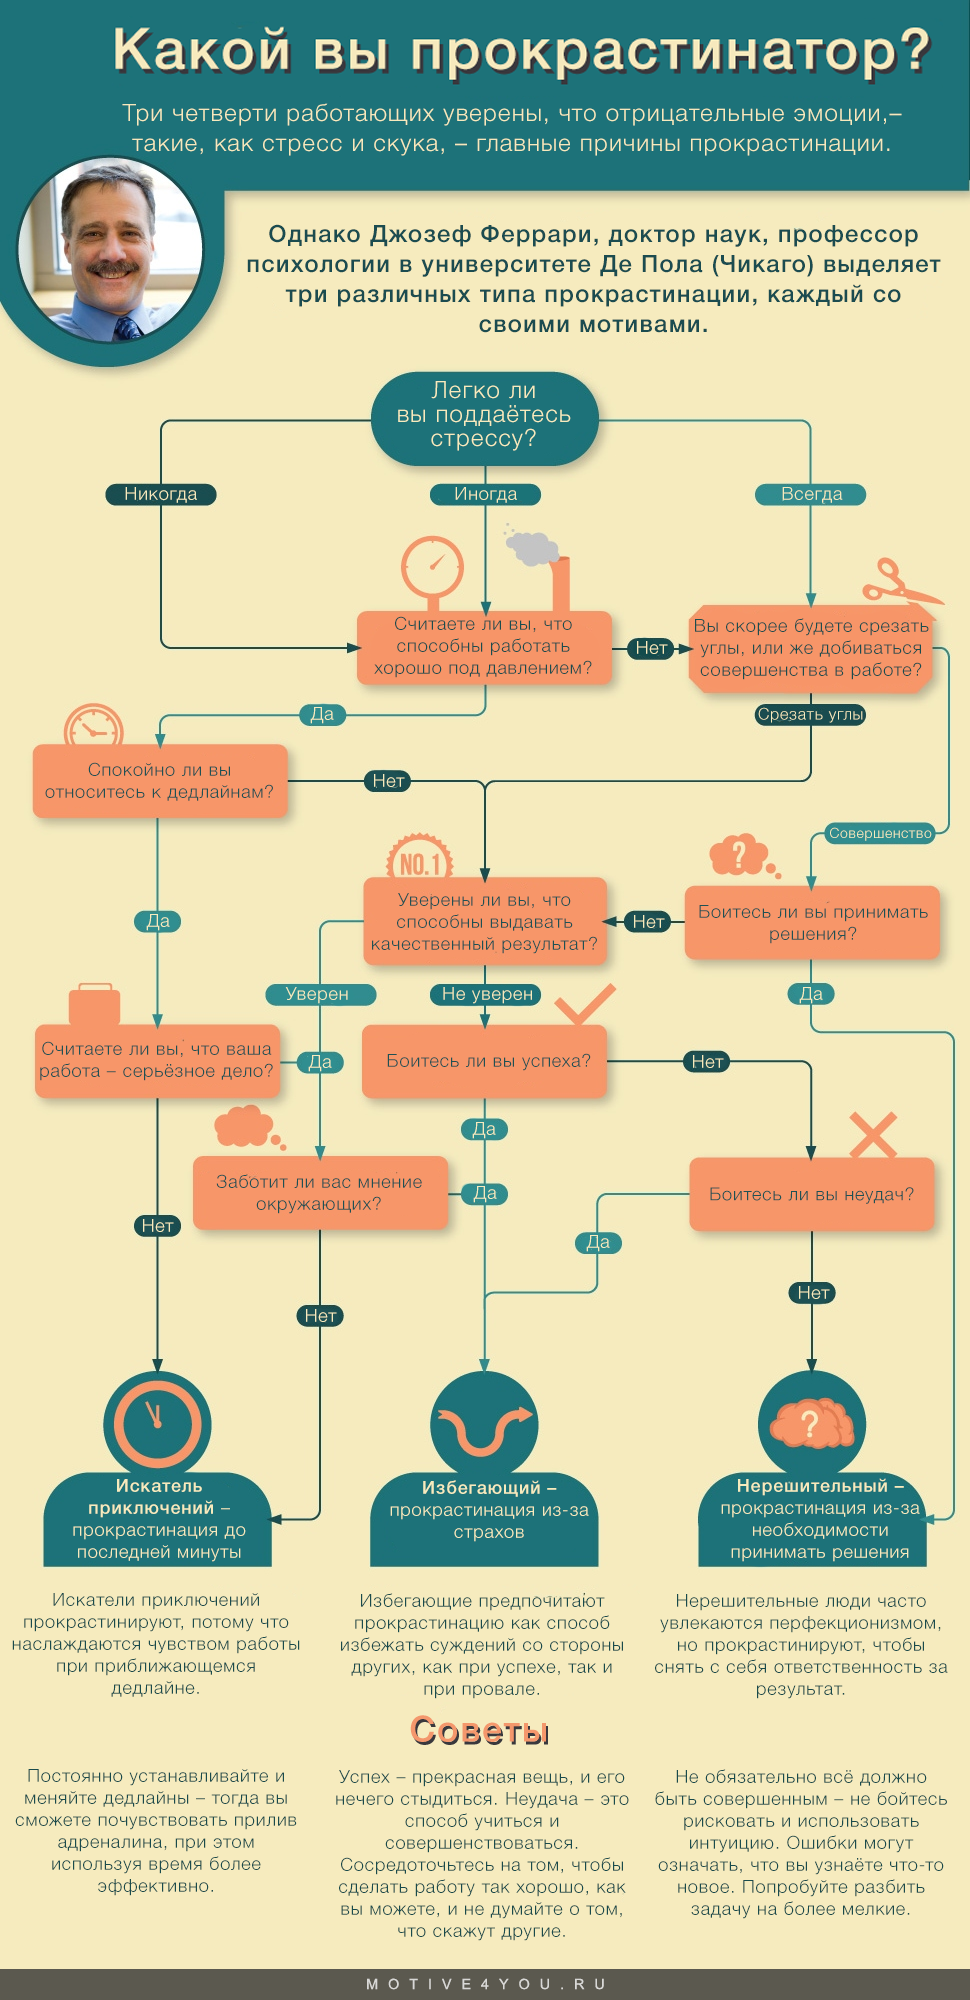 типы прокрастинации на работе - инфографика